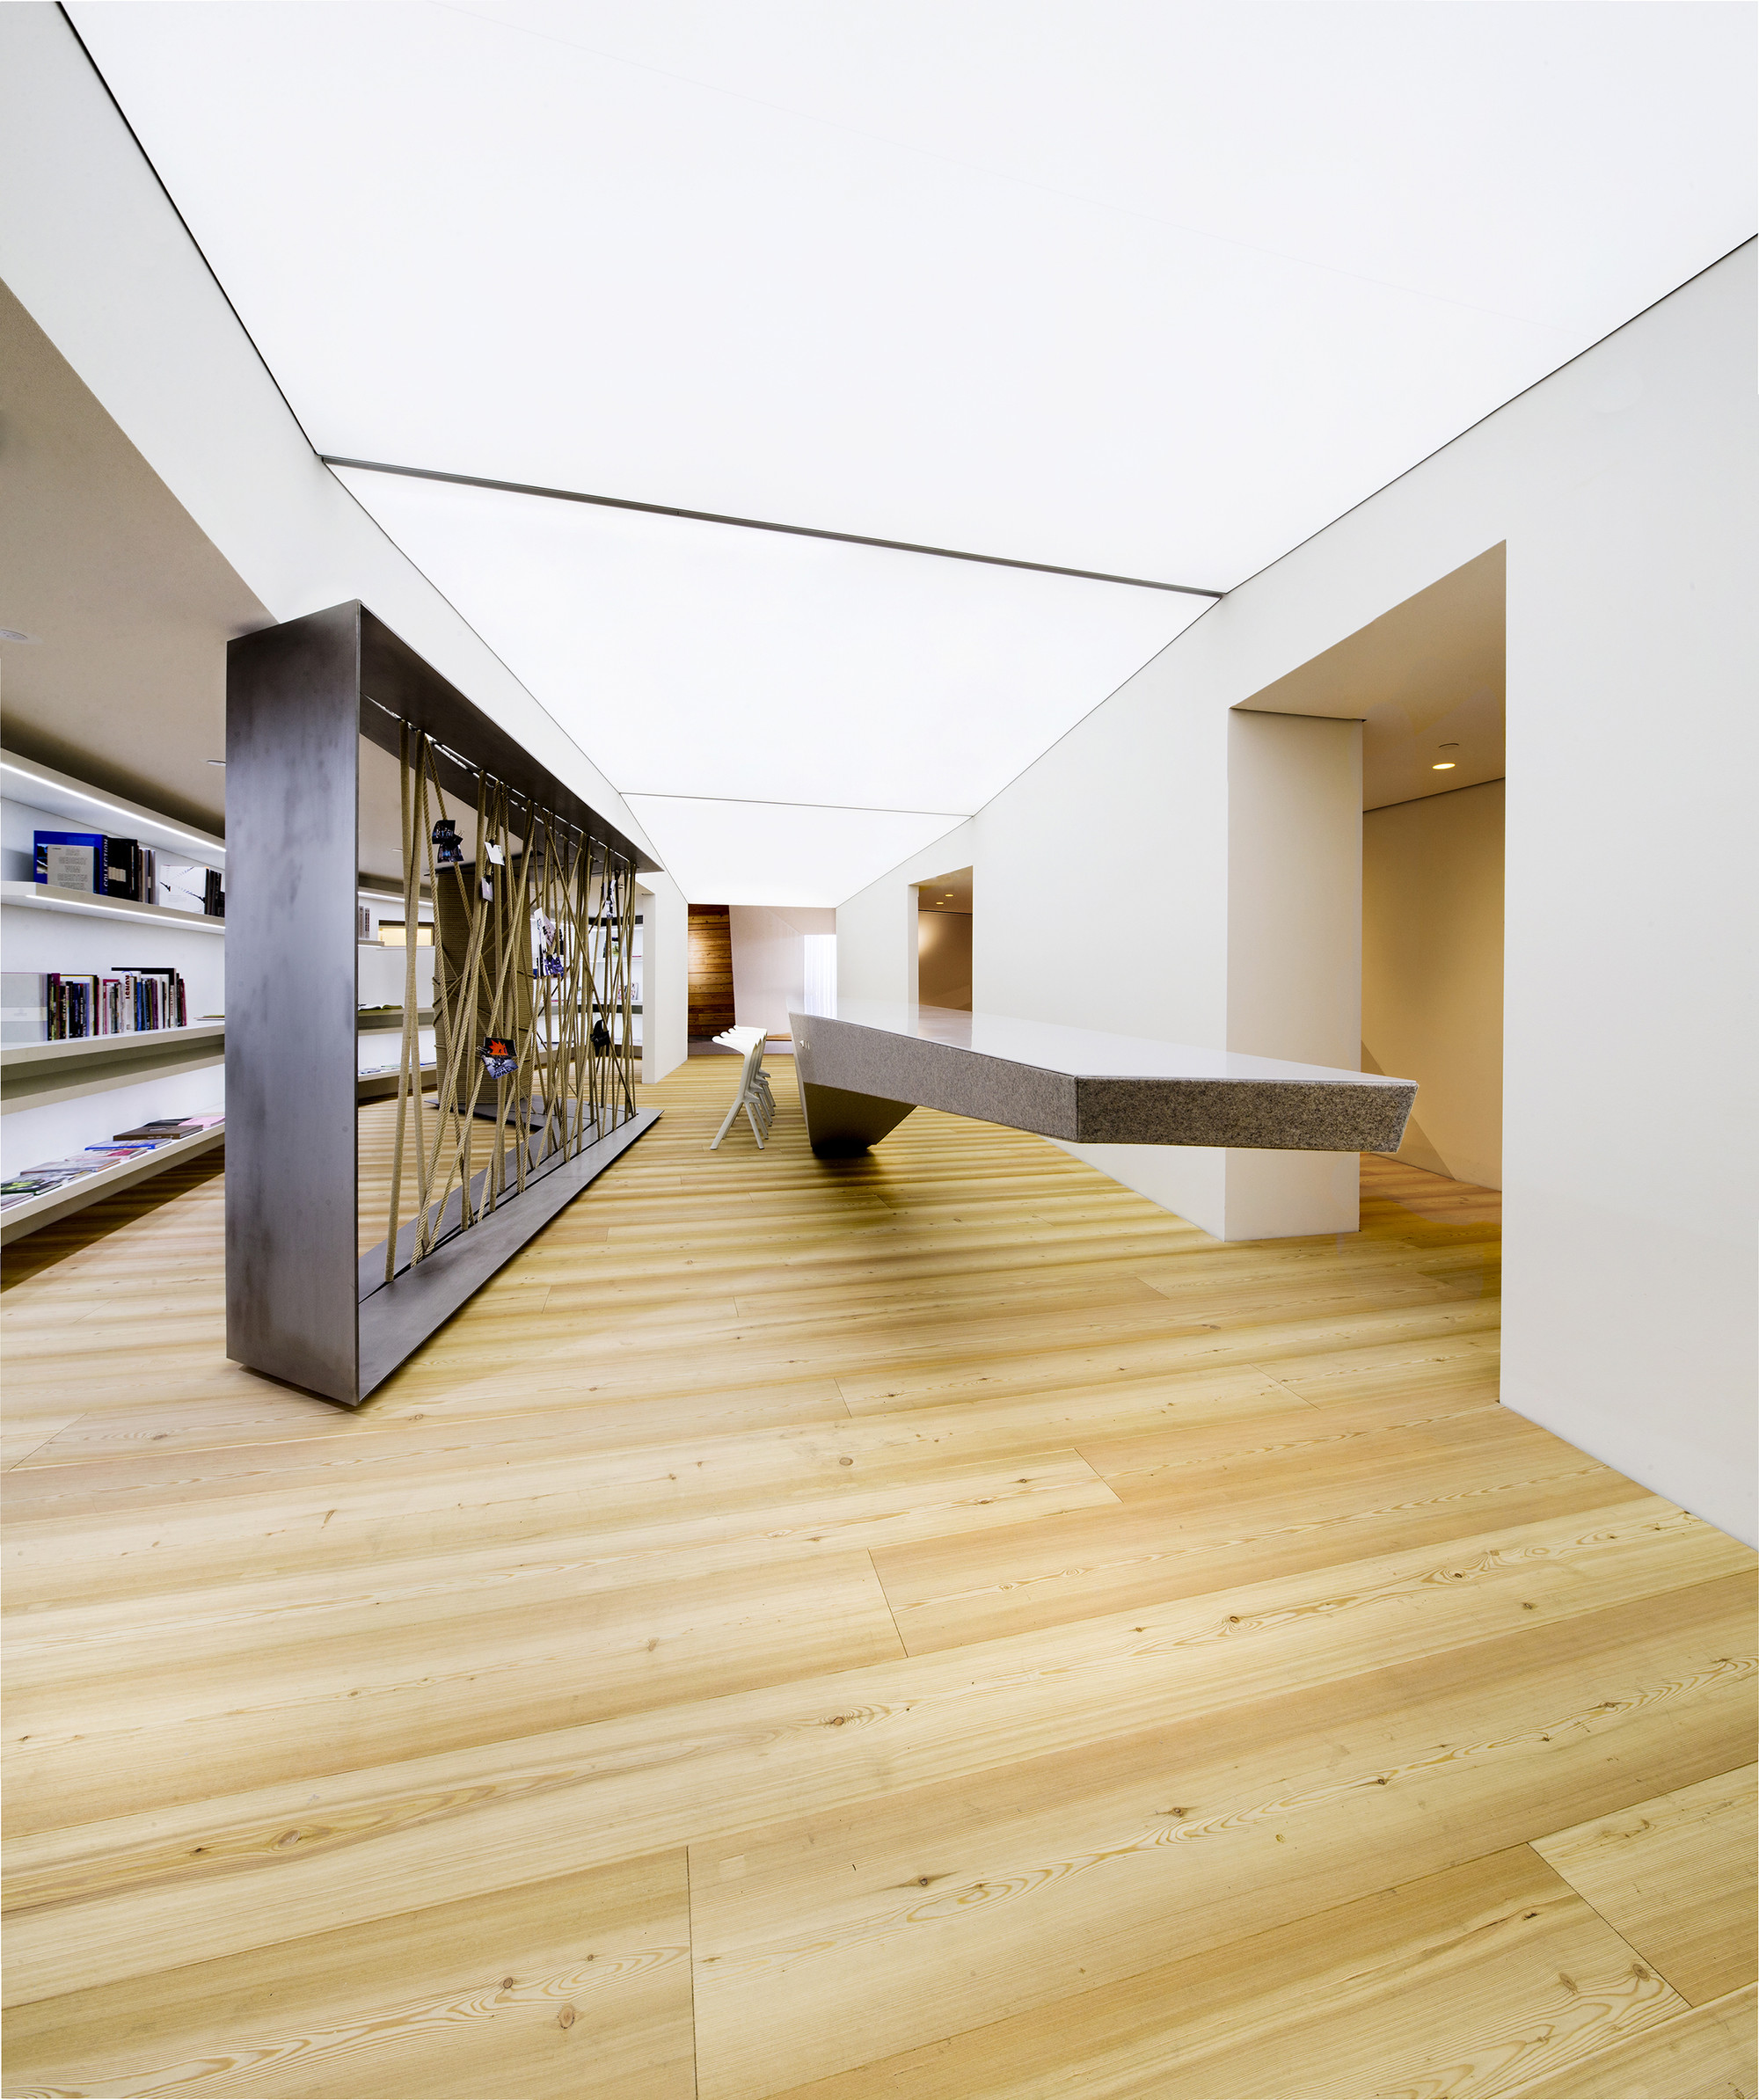 galeria de kreativlabs sch ne r ume architektur. Black Bedroom Furniture Sets. Home Design Ideas